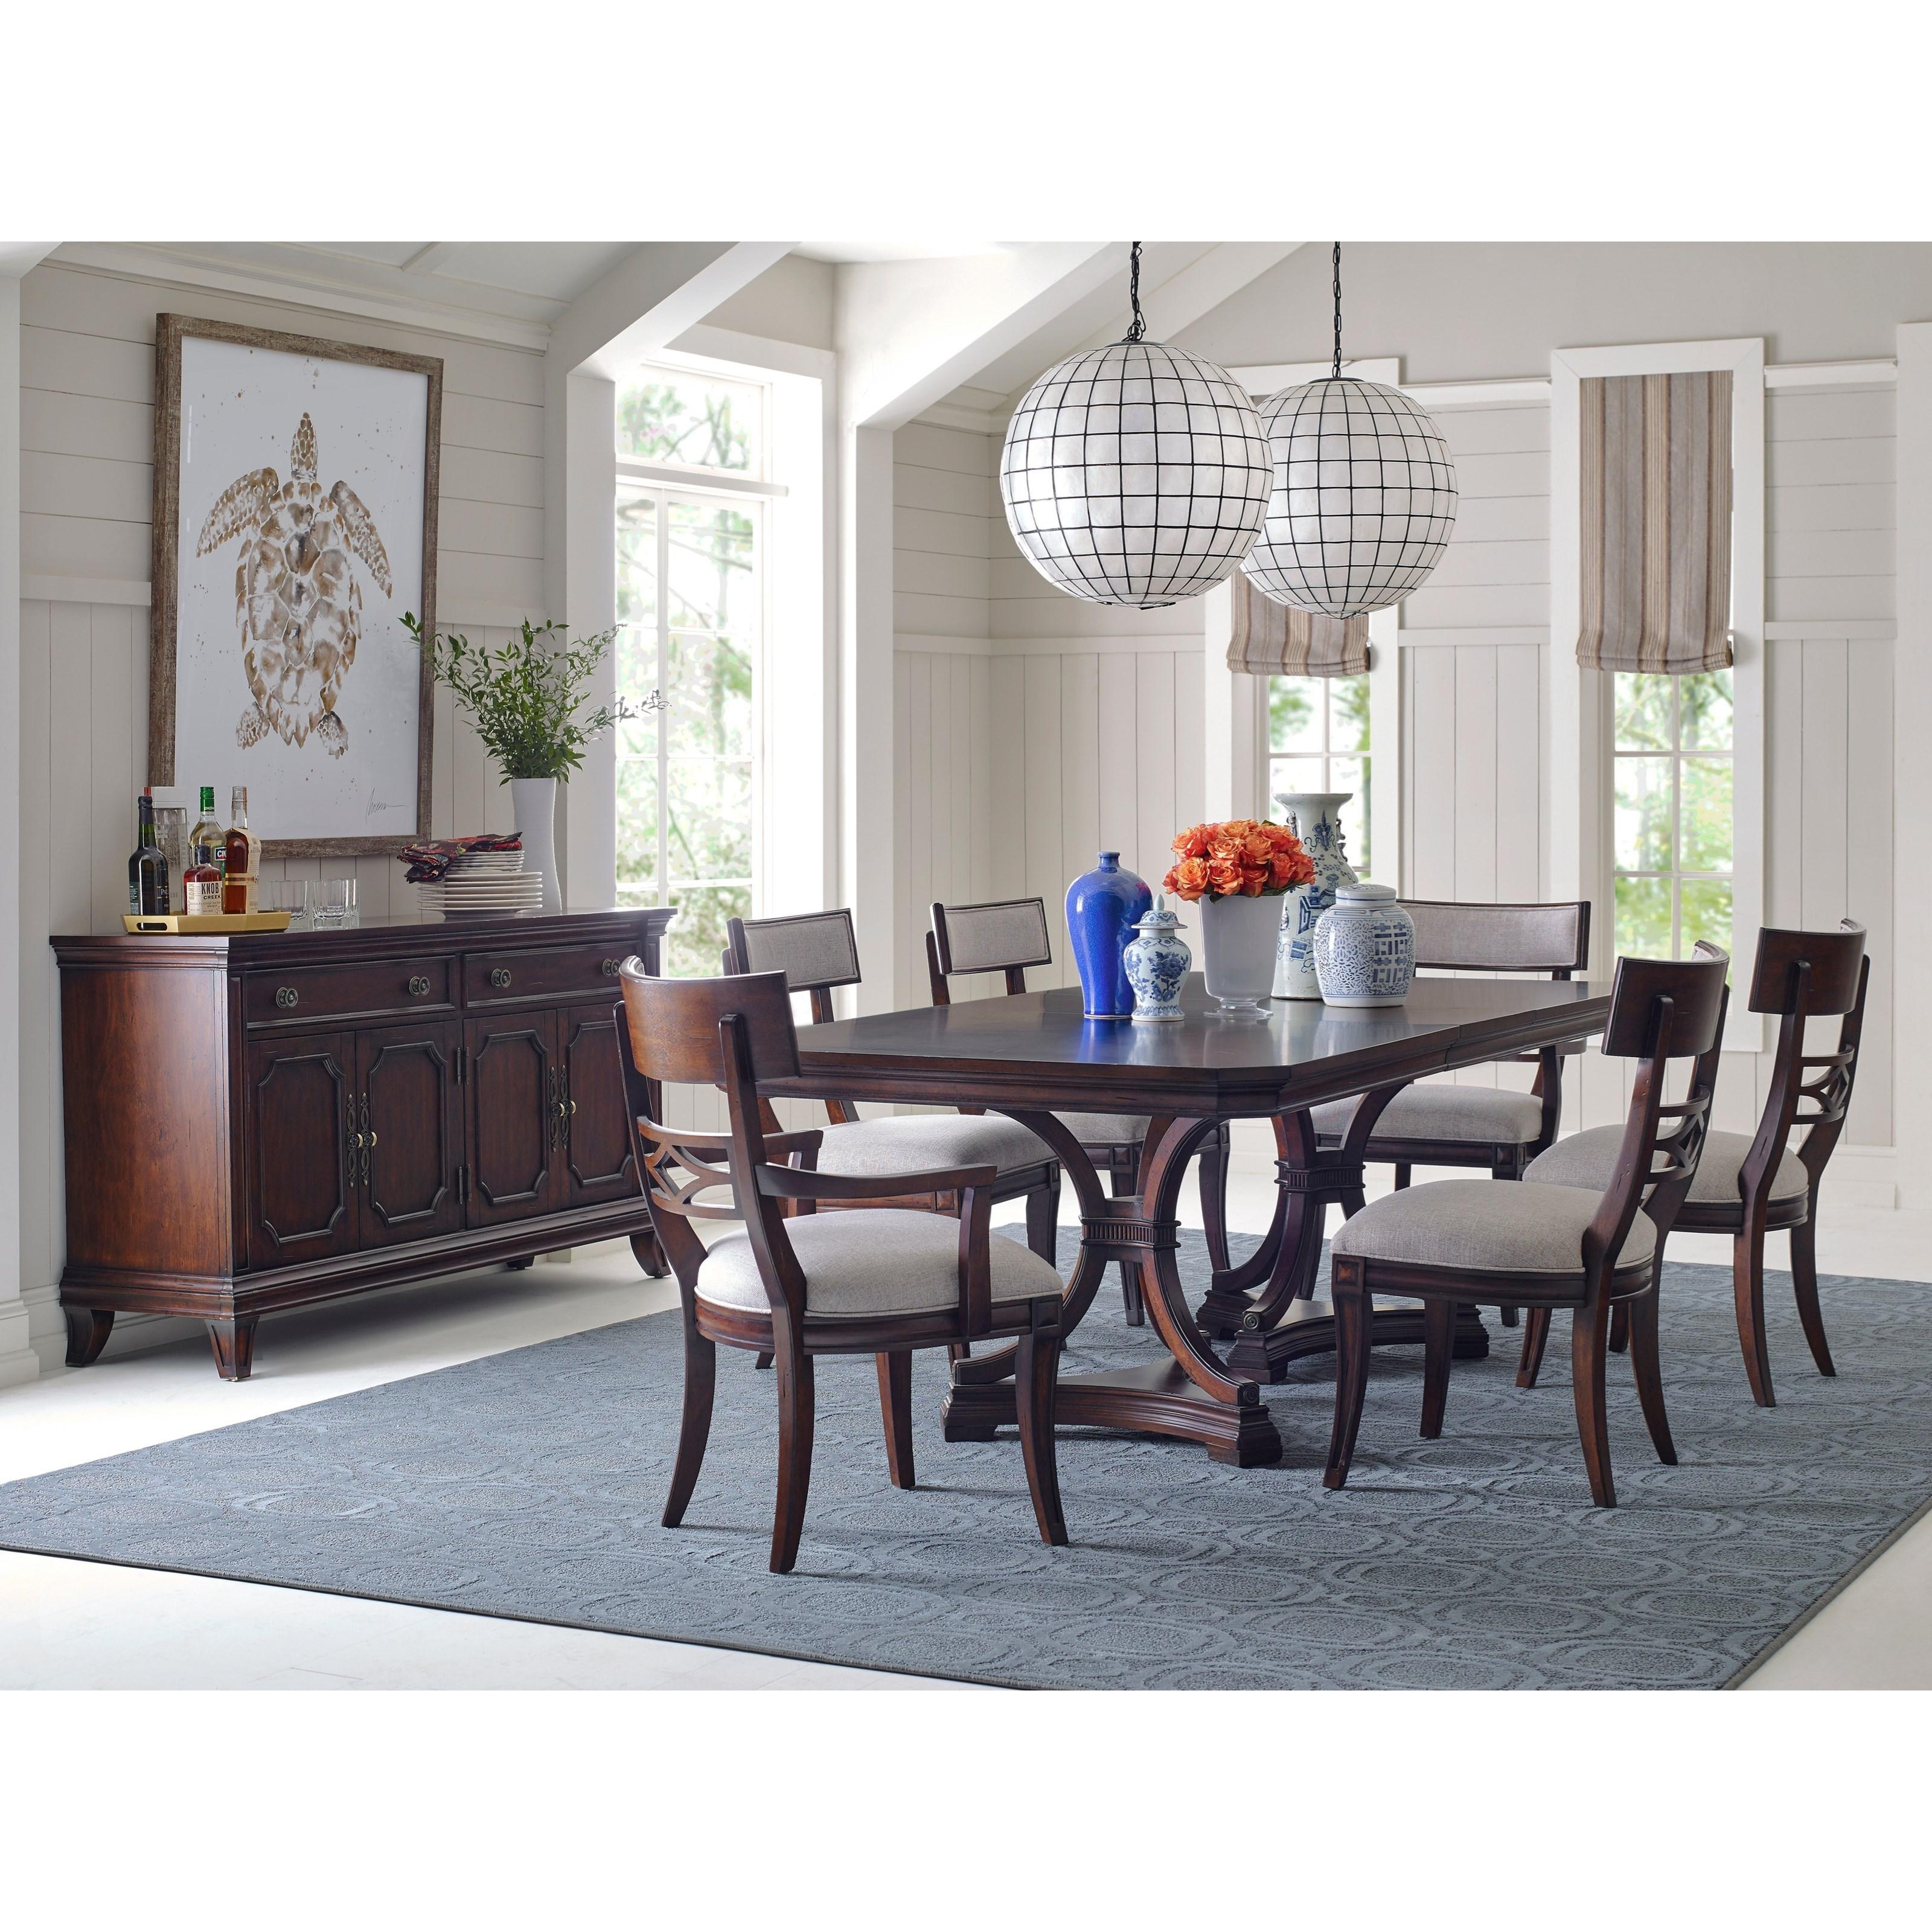 Baers dining room